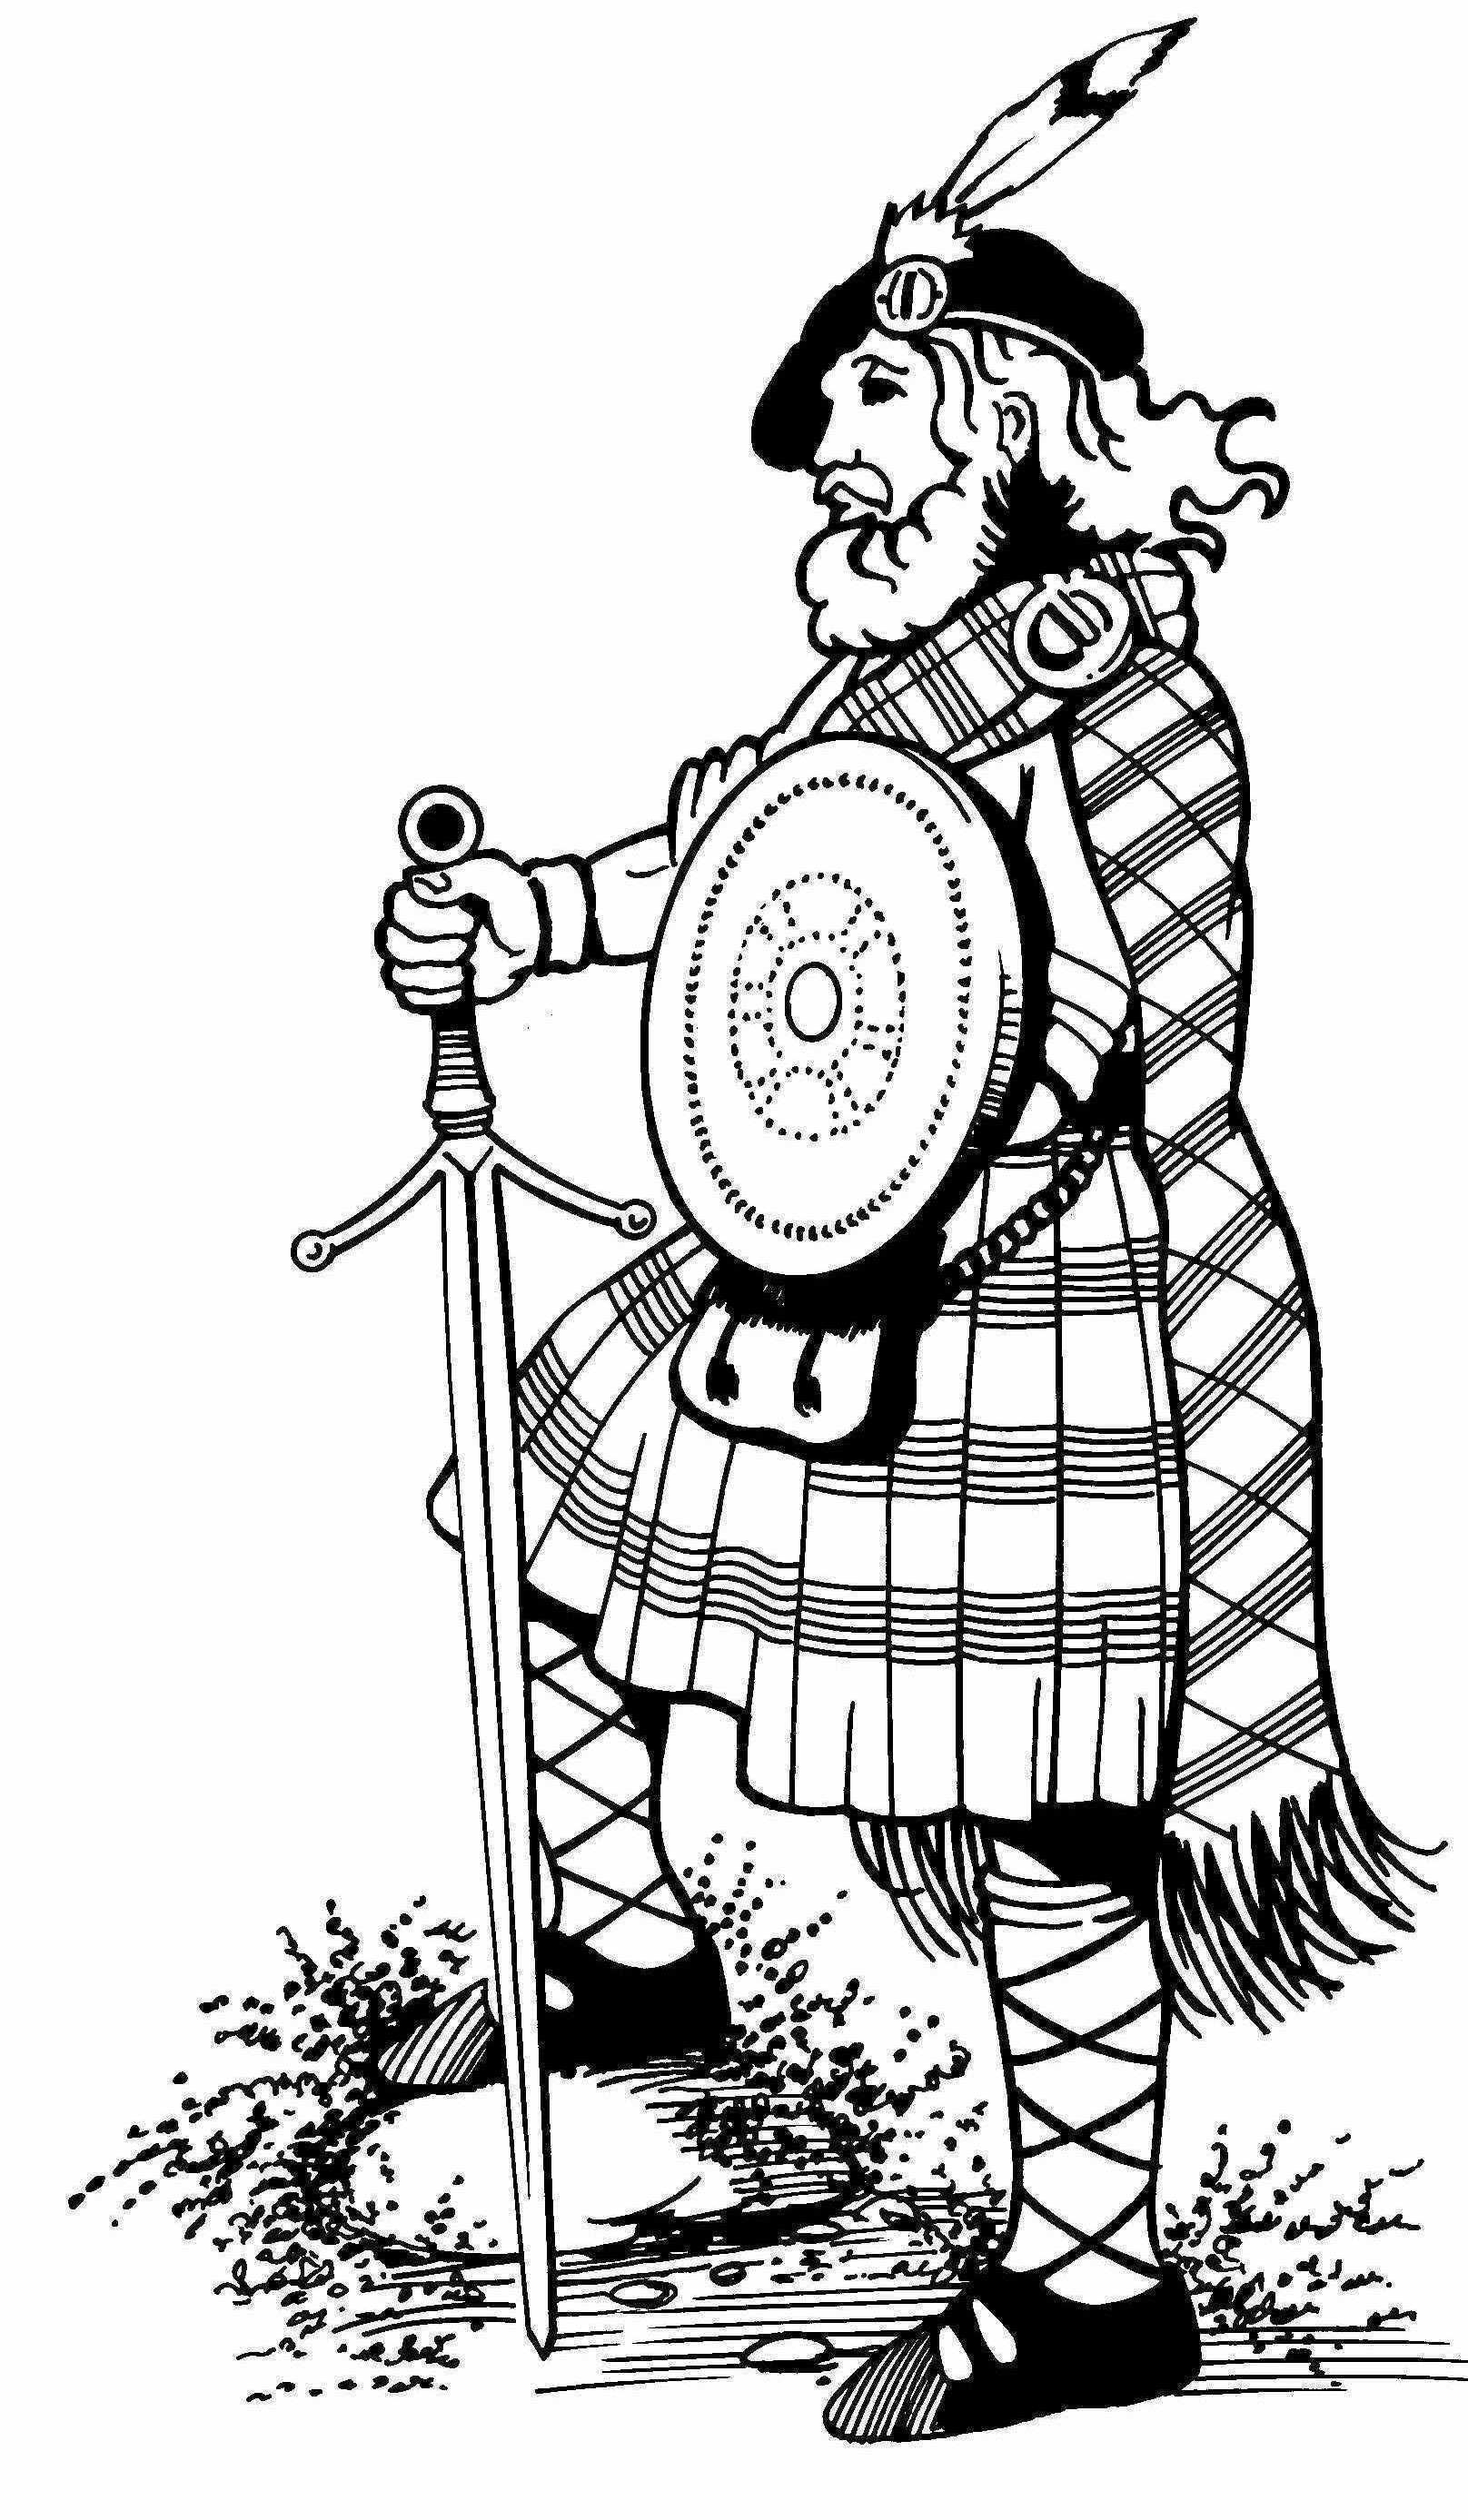 Highlander Tartan Wear in Kilmarnock & Ayr, Ayrshire, Scotland.